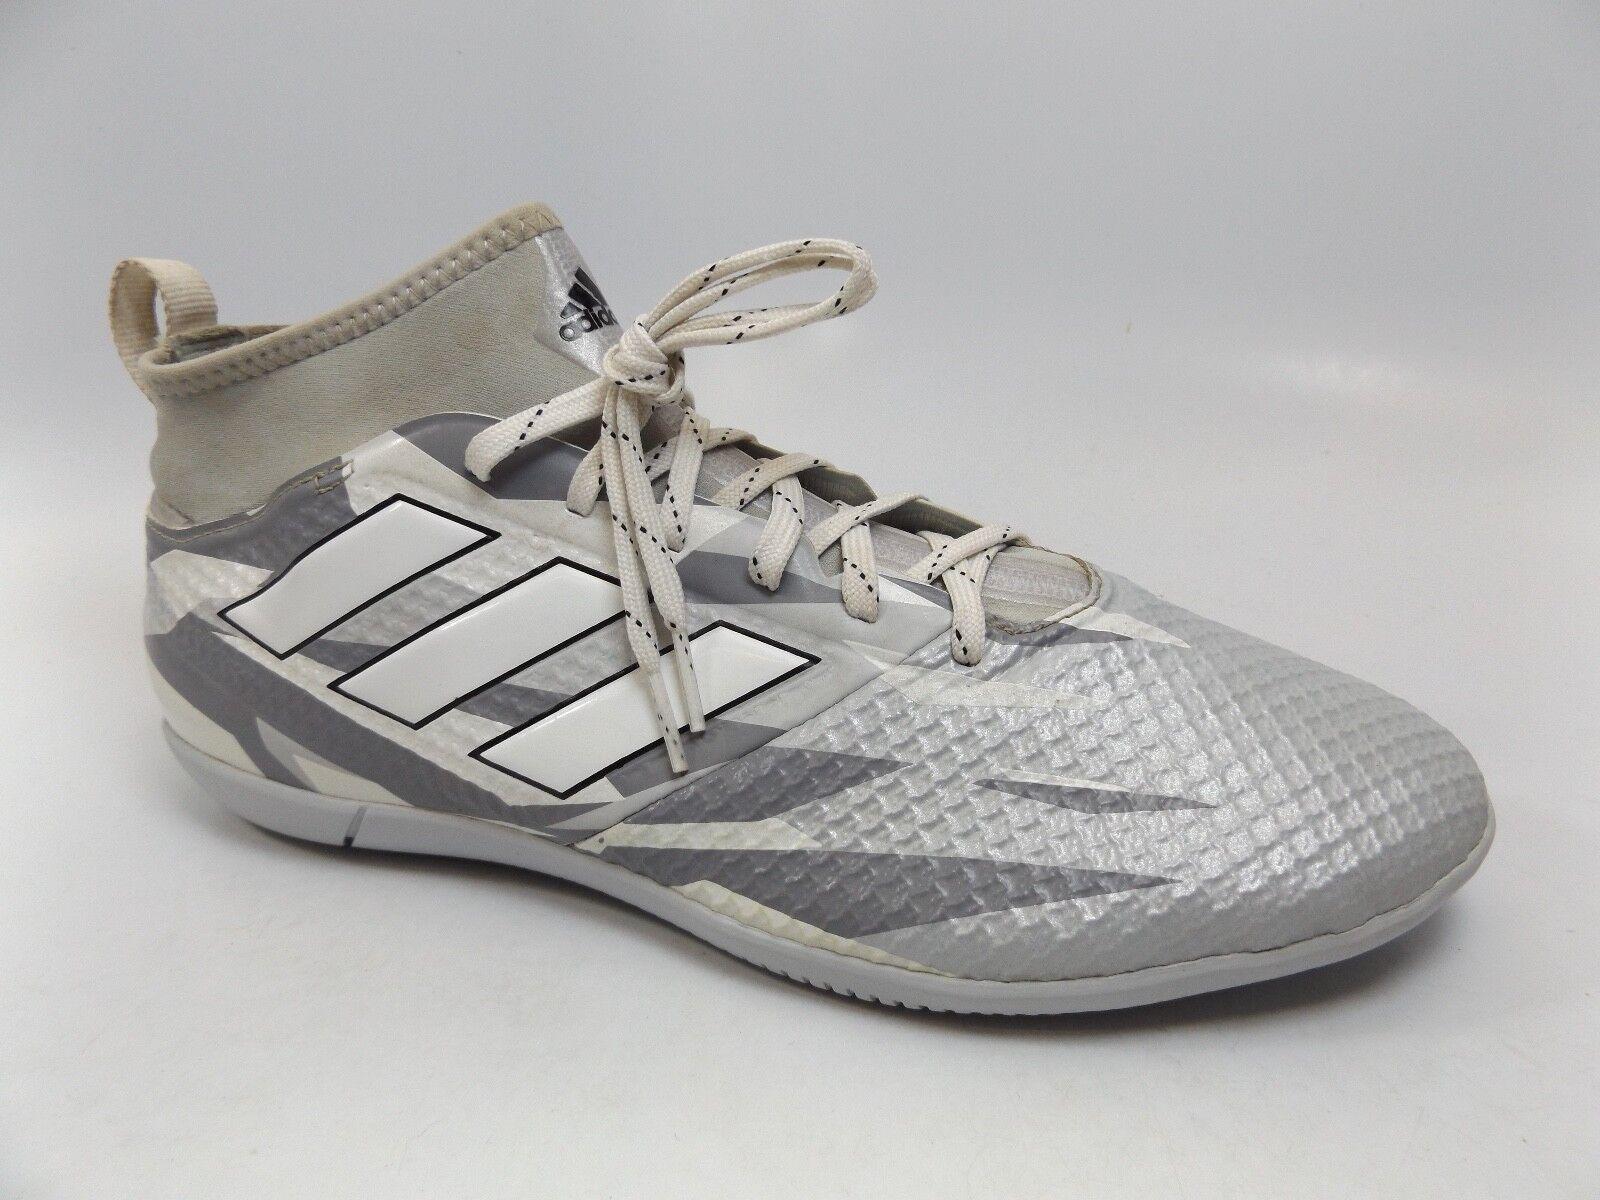 Adidas ace 17,3 primemesh - indoor - männer fußball - primemesh revier (sz 11,5 m] bereits im besitz d8158 49c69d